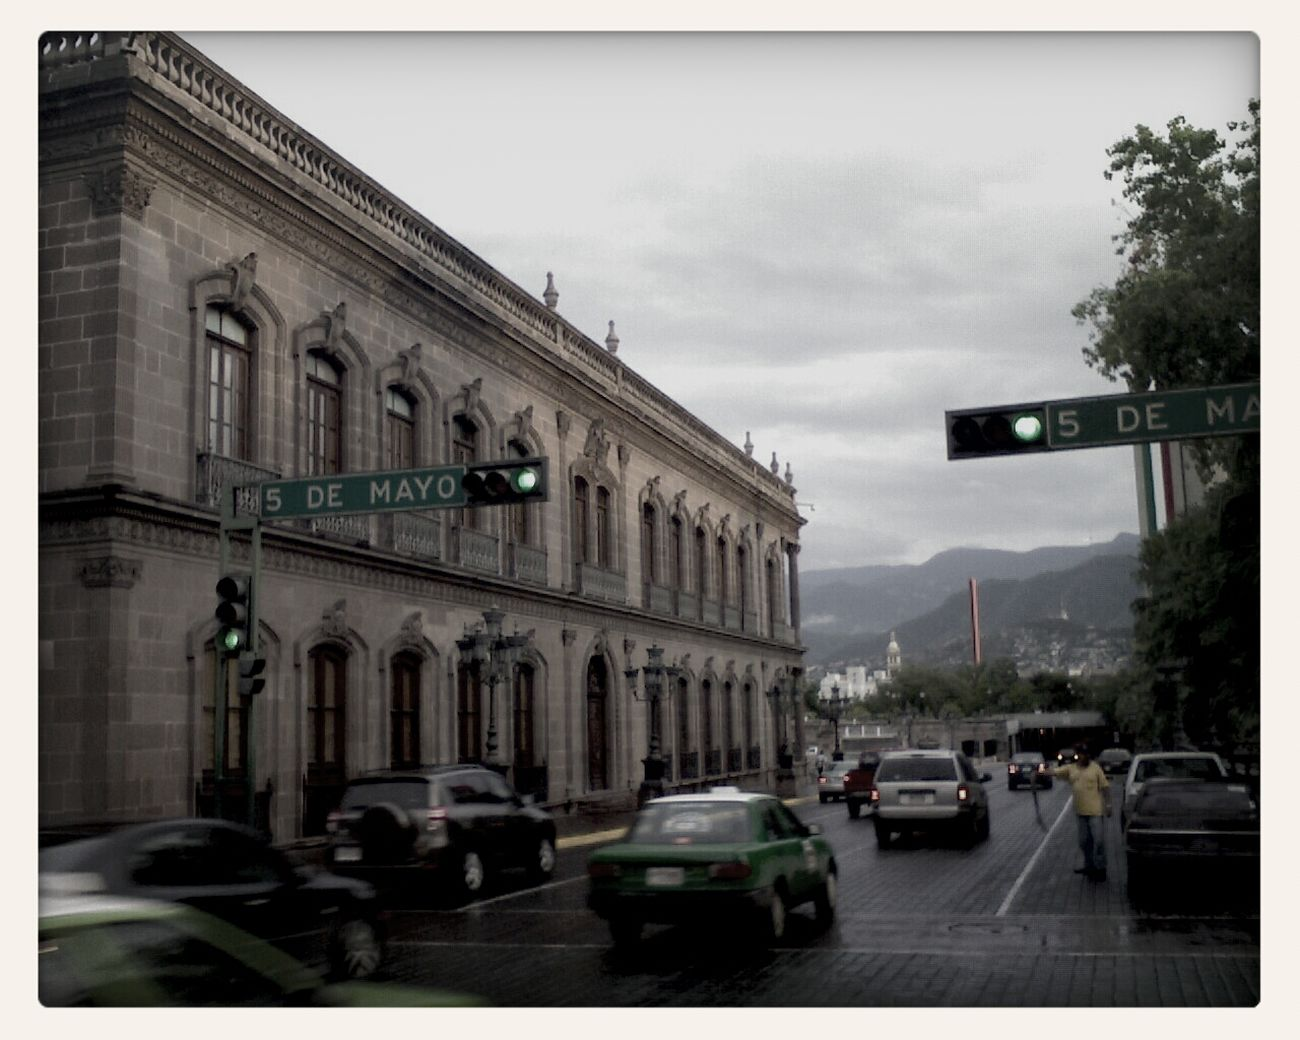 Ave. 5 De Mayo Macroplaza Monterrey, México Architecture